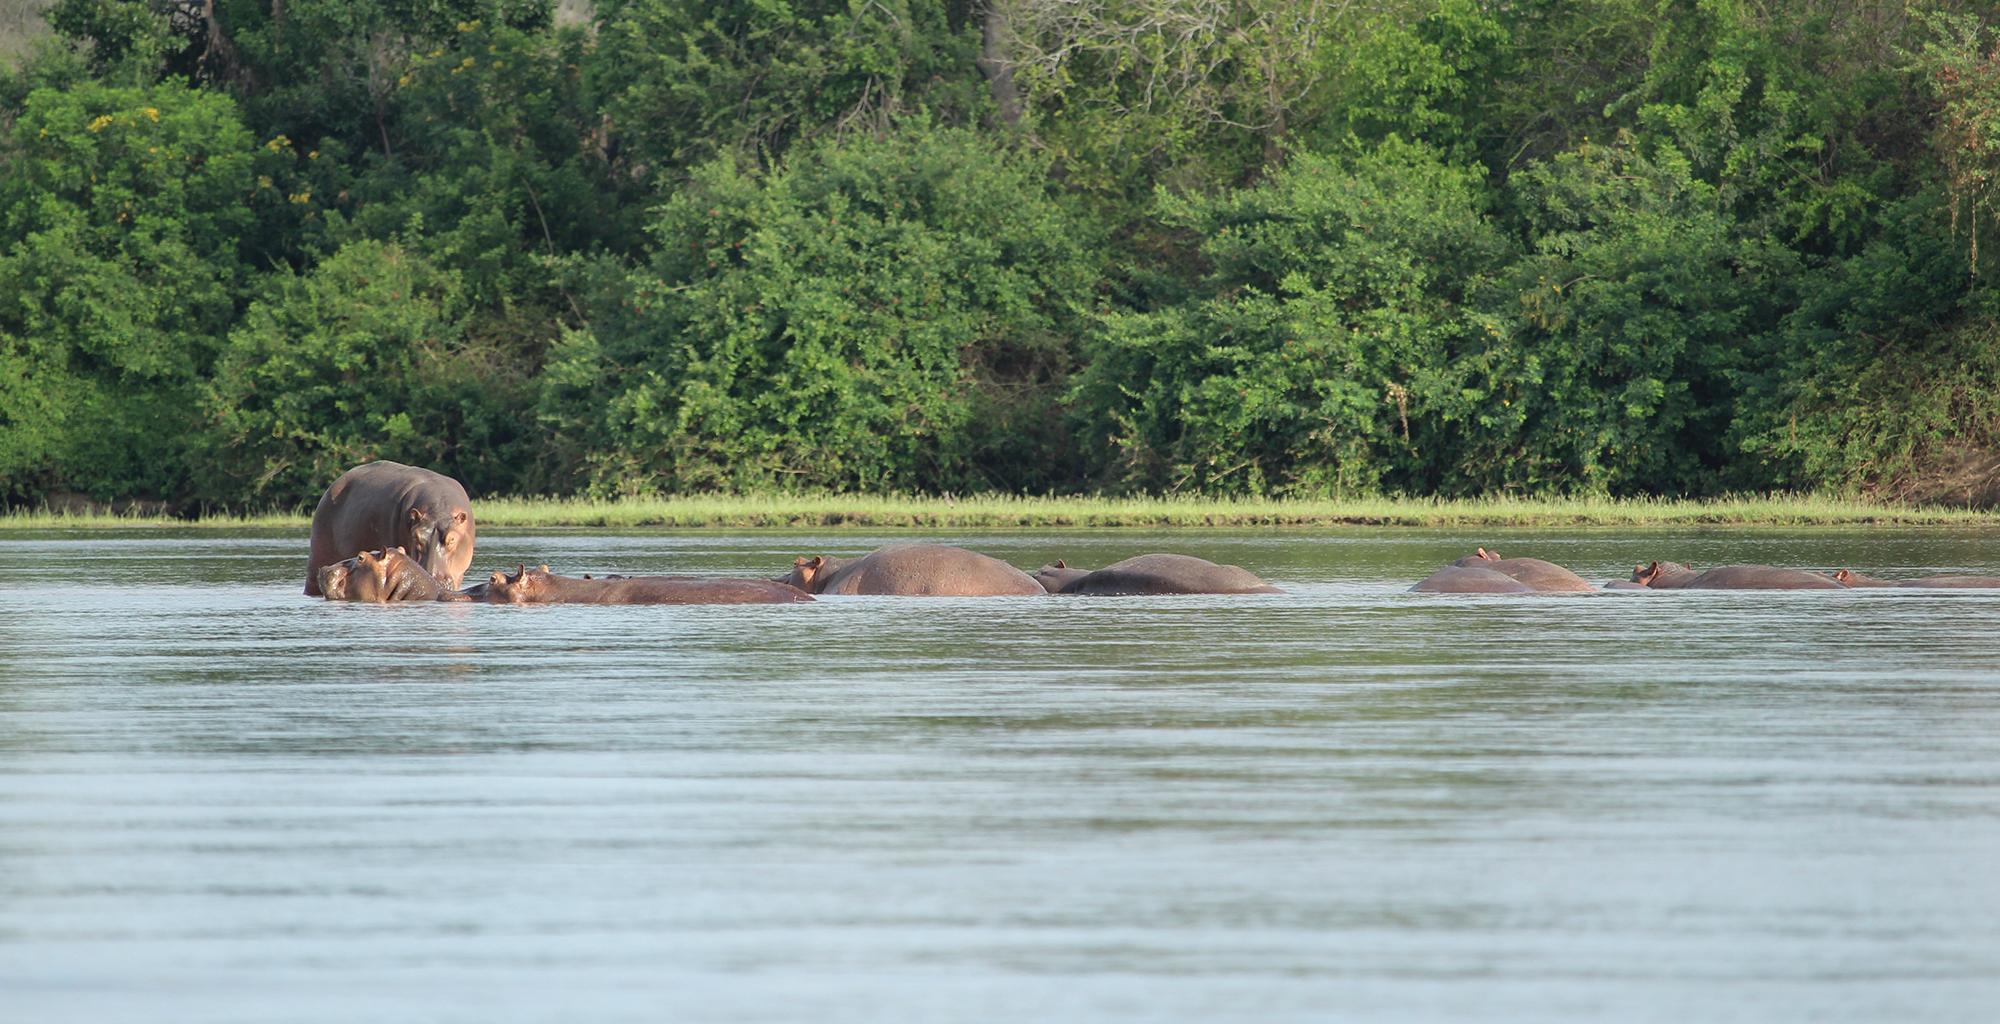 Tanzania-Selous-Walking-Safari-Wildlife-Hippo